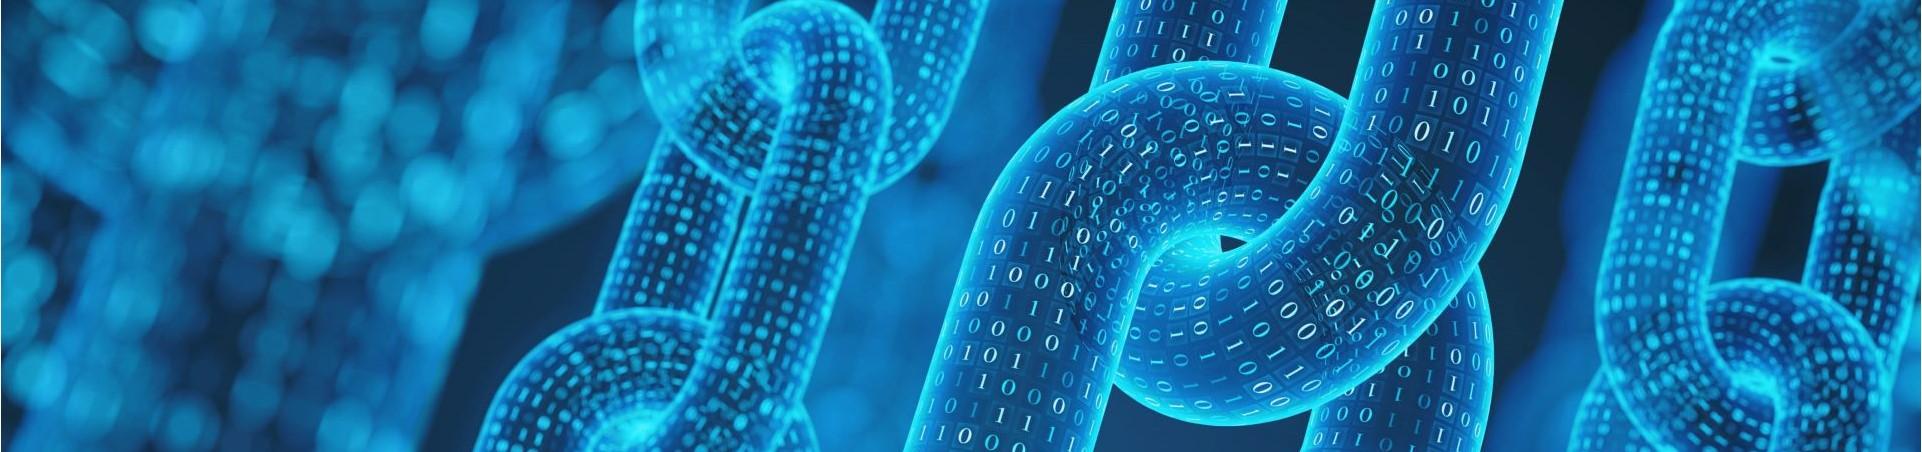 Blockchain chain links